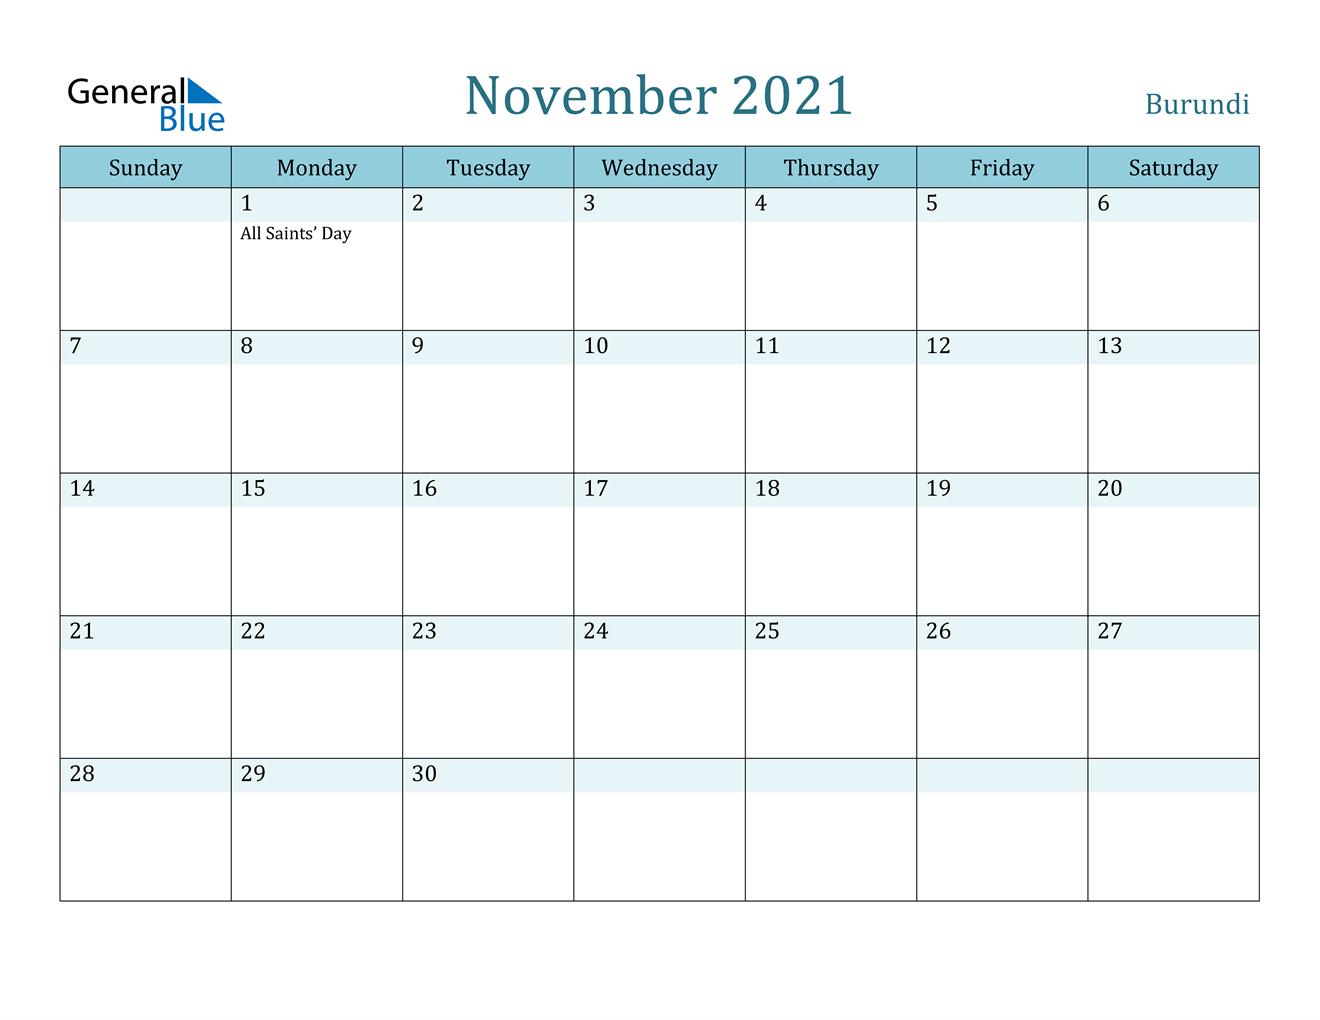 November 2021 Calendar Burundi